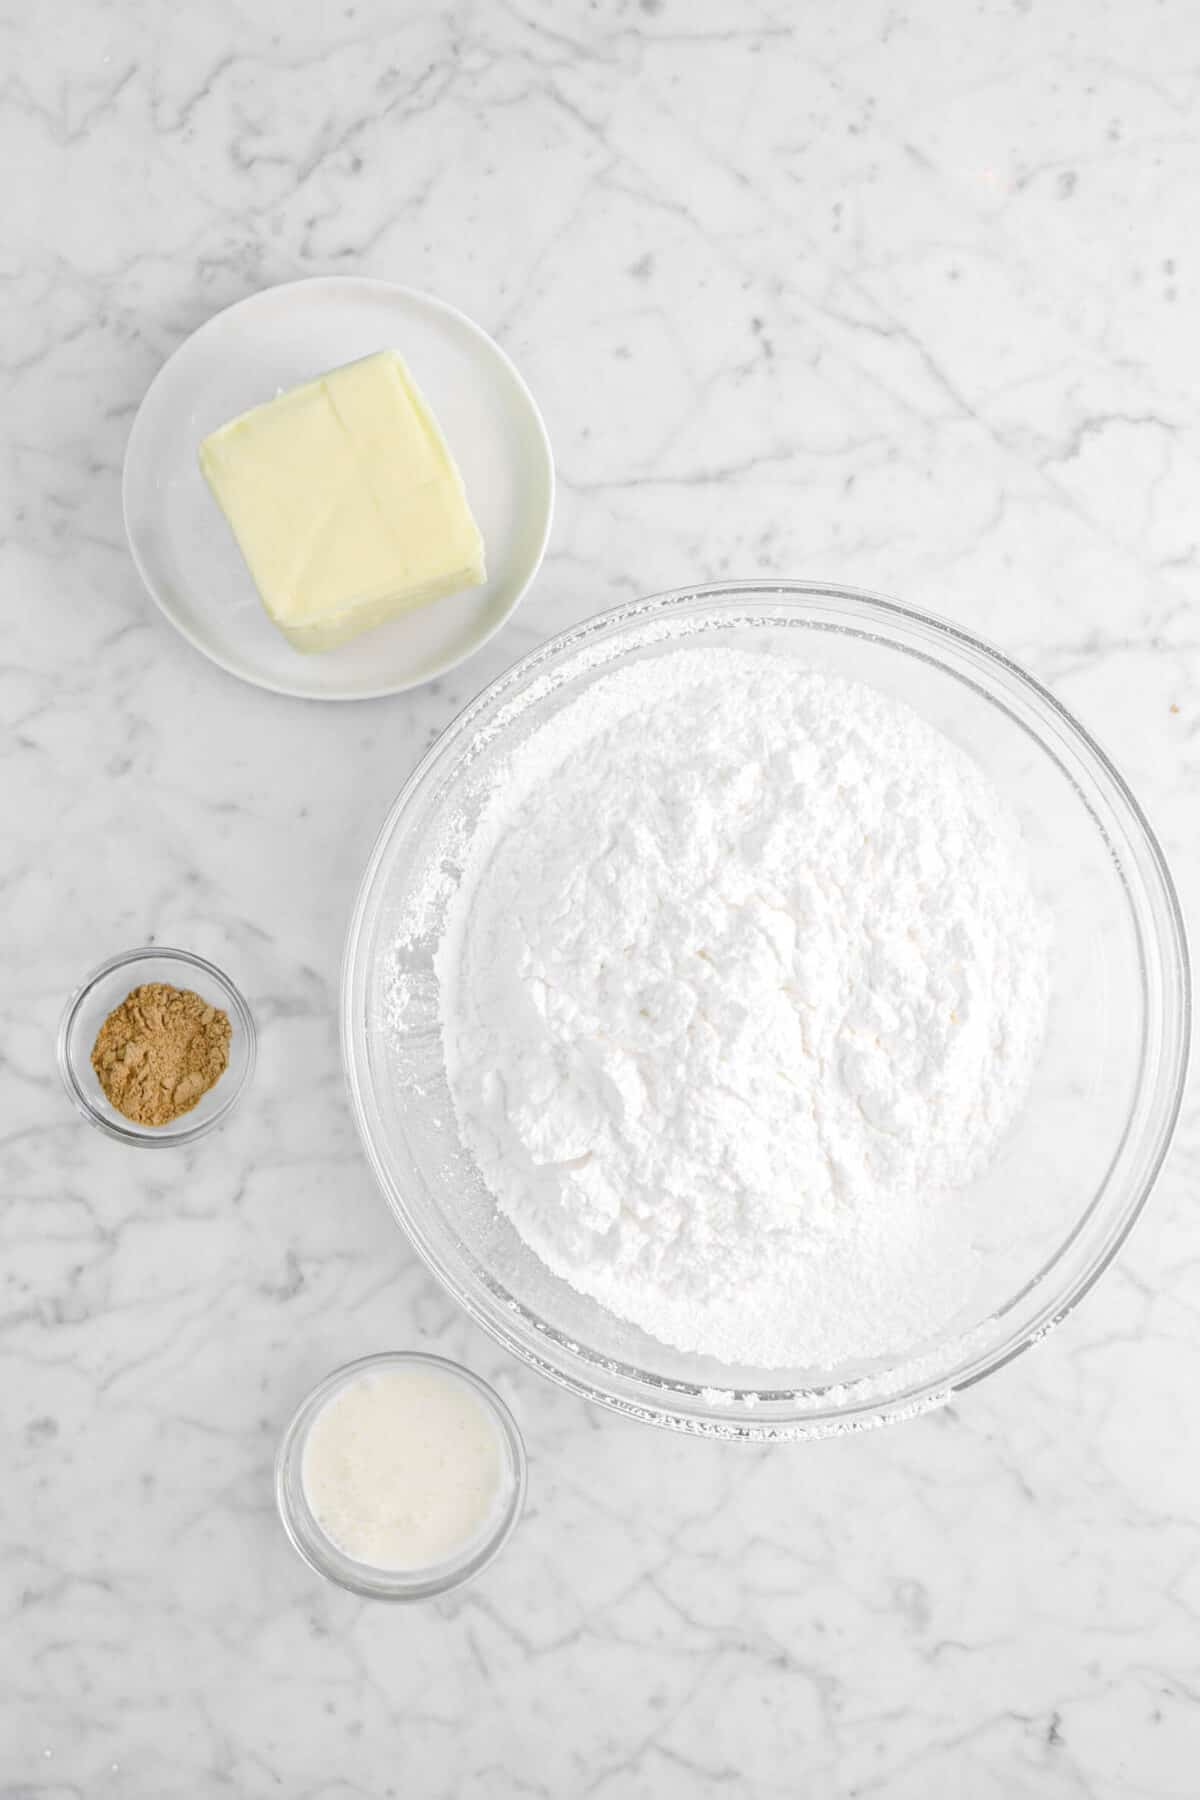 butter, chai spice, cream, powdered sugar in bowls